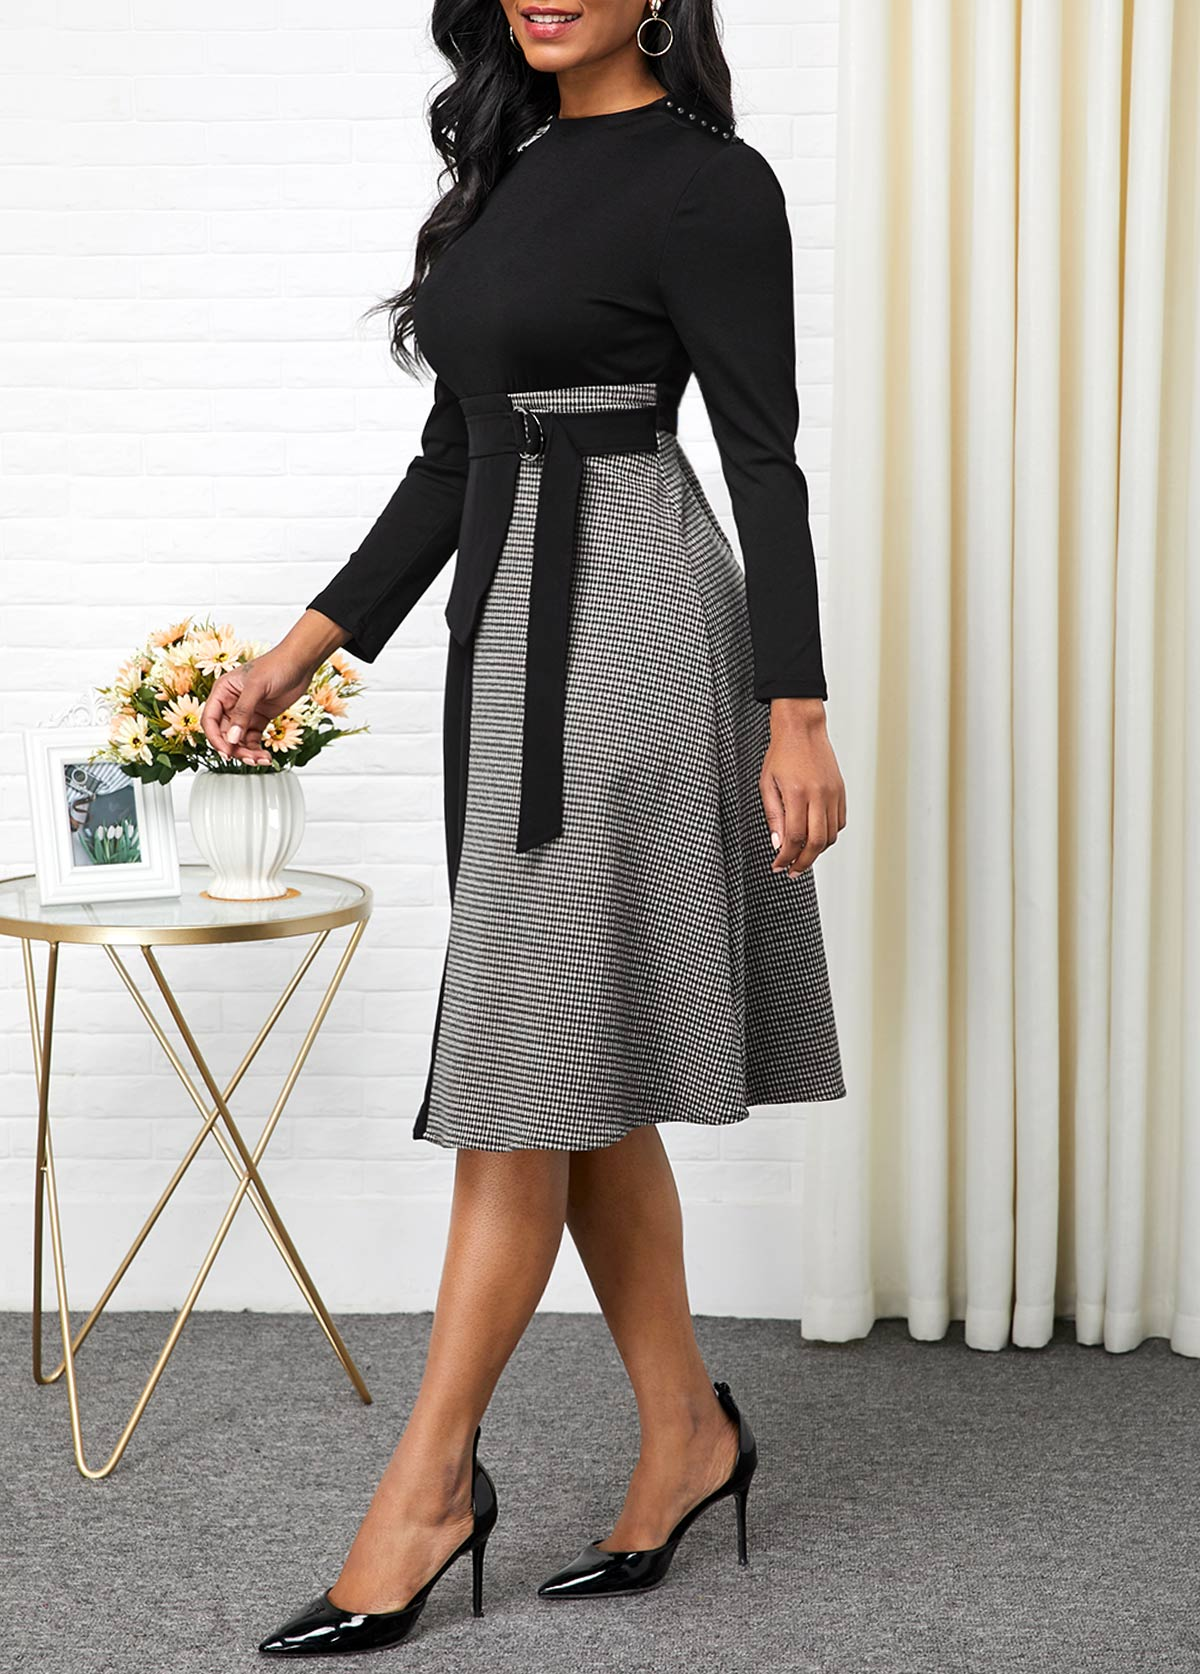 Buckle Detail Long Sleeve Contrast Dress